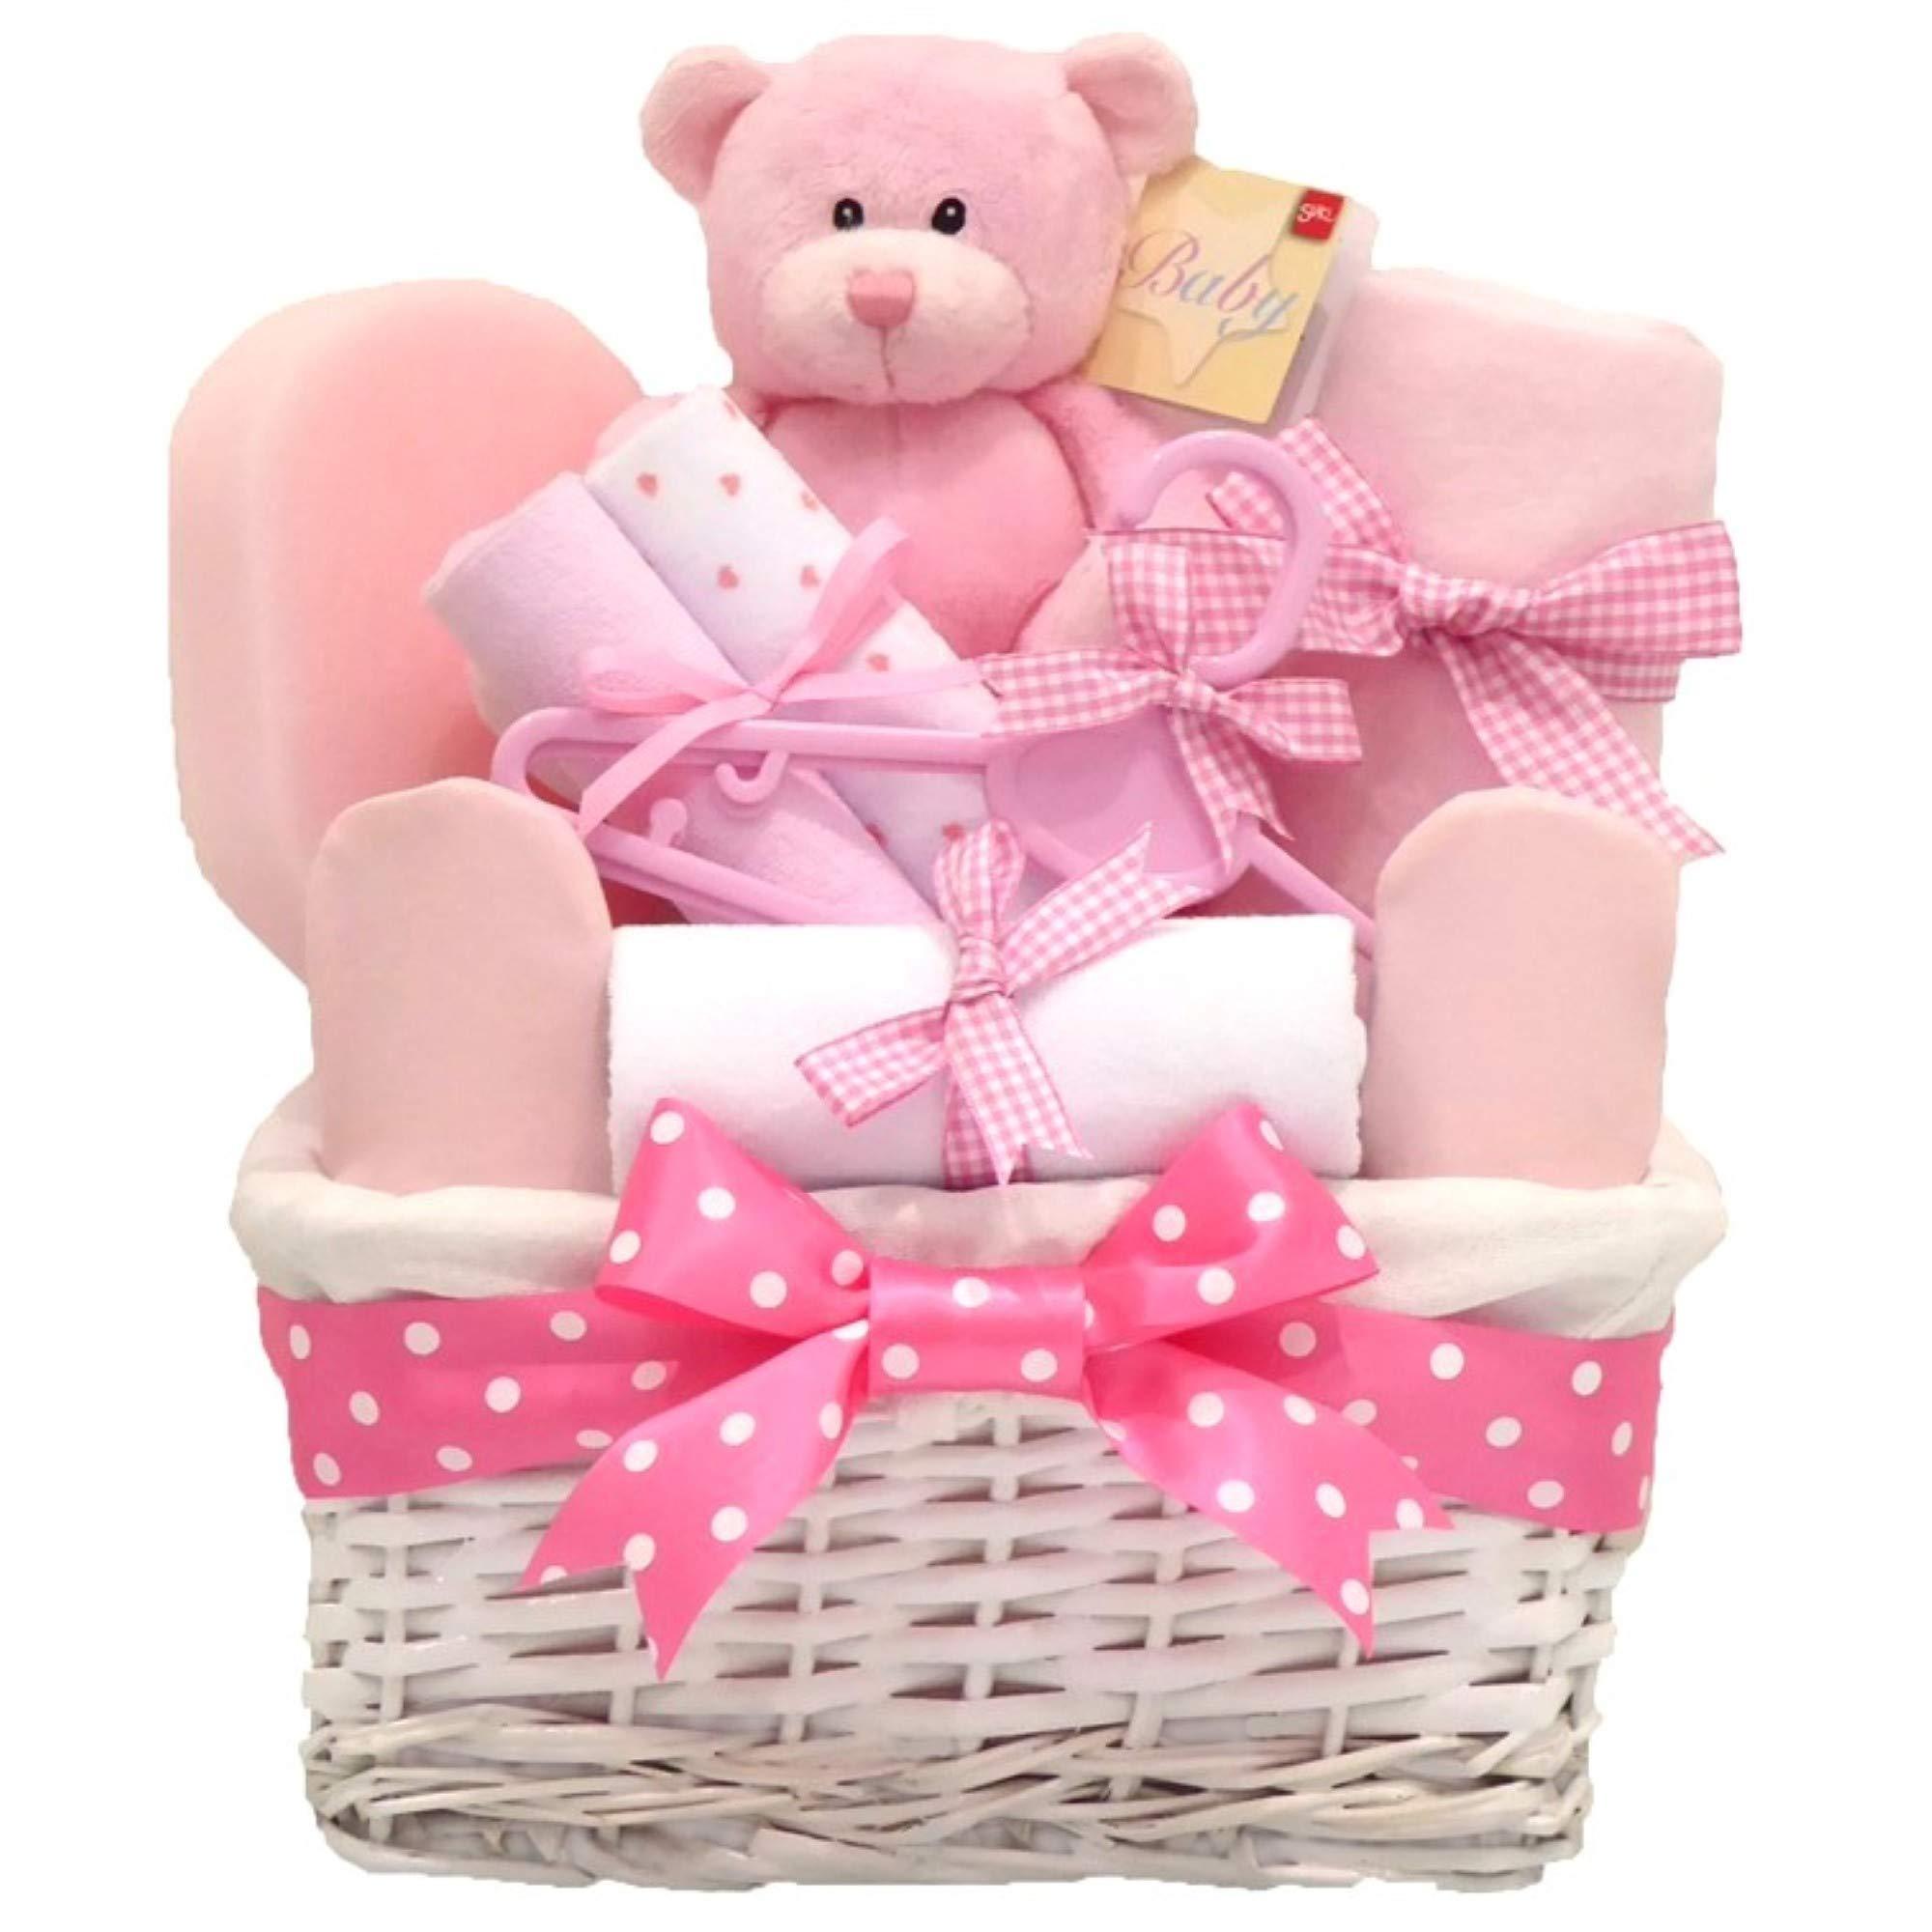 Newborn Essentials Baby Pink with Baby Clothes Baby Girl Gift Basket Hamper